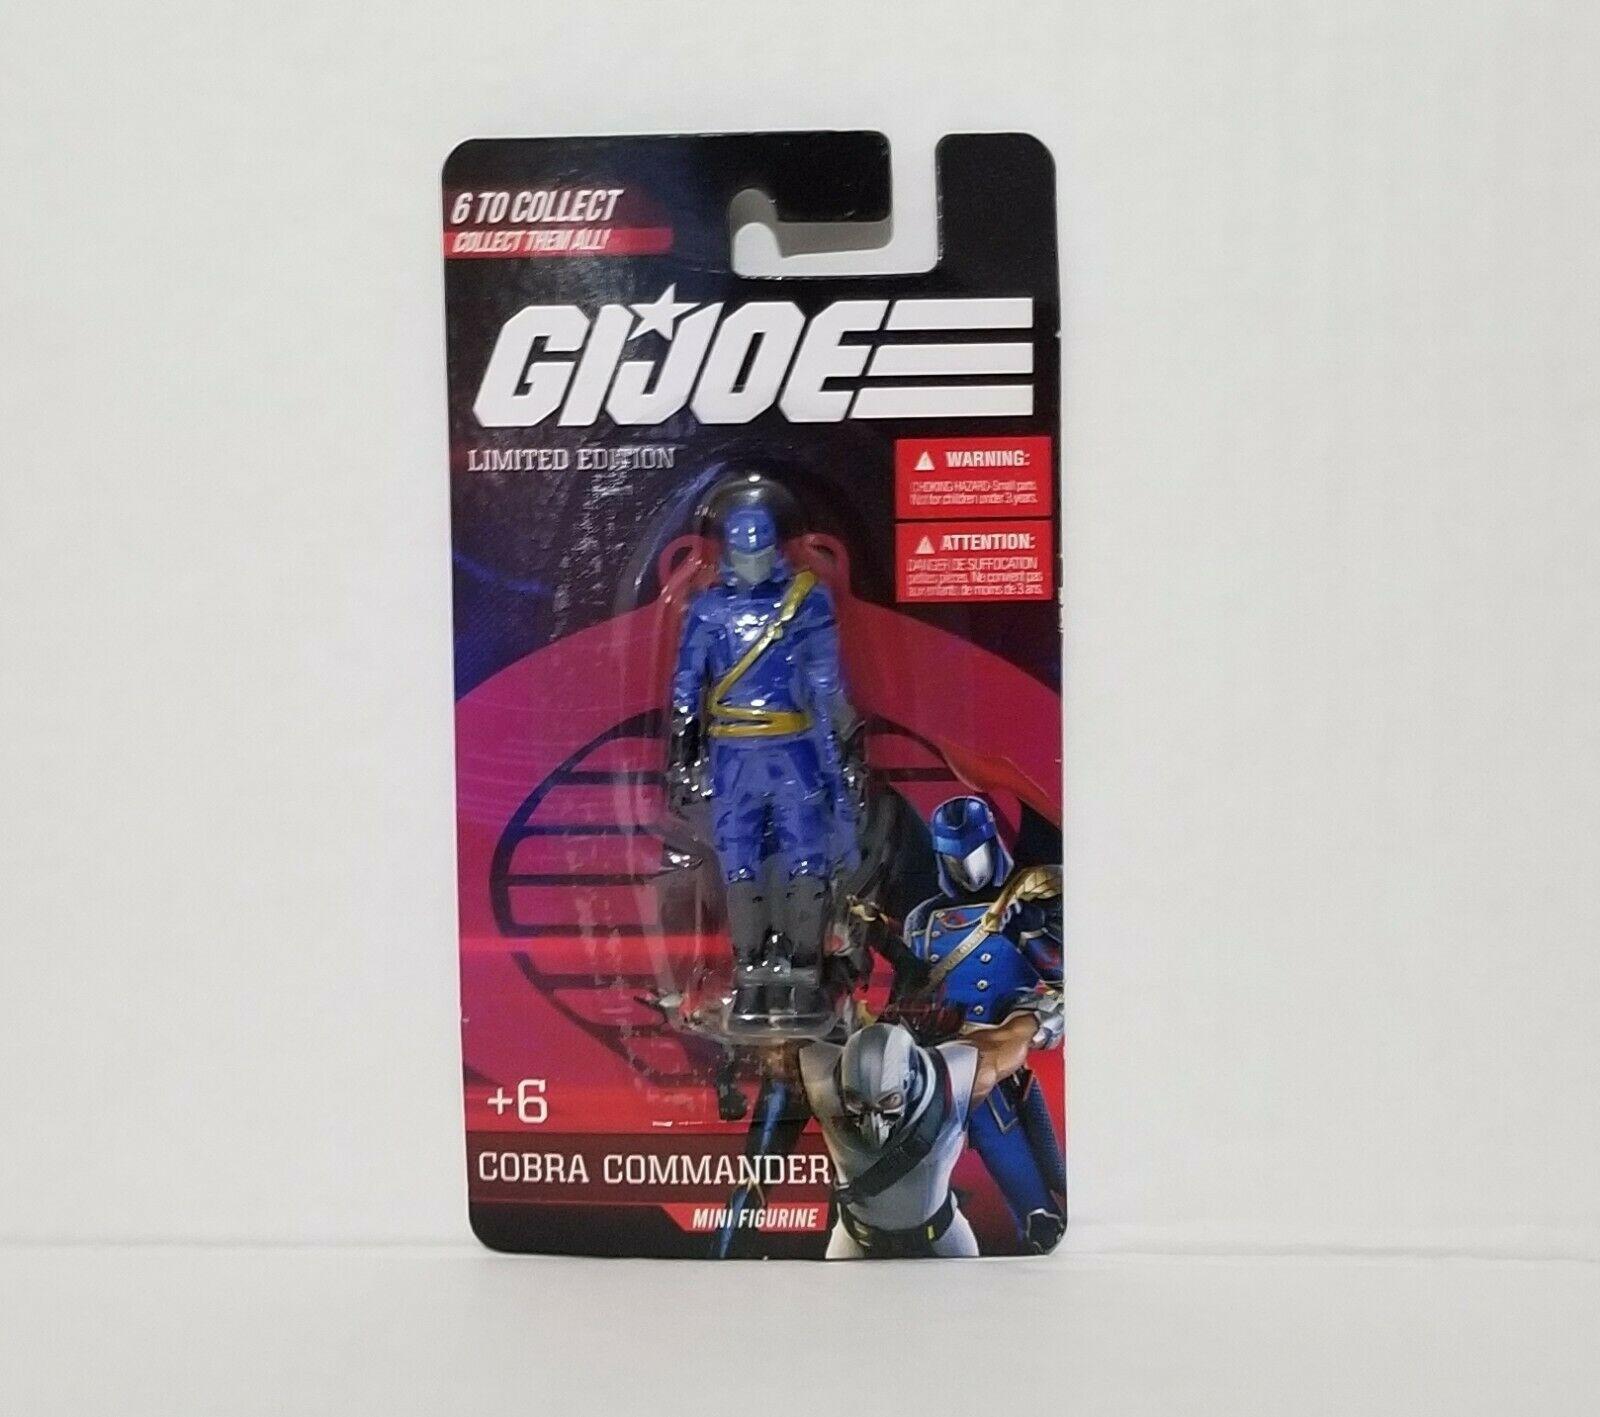 G.I. Joe Limited Edition 2021 Mini Figurine -  Collect Them All!!